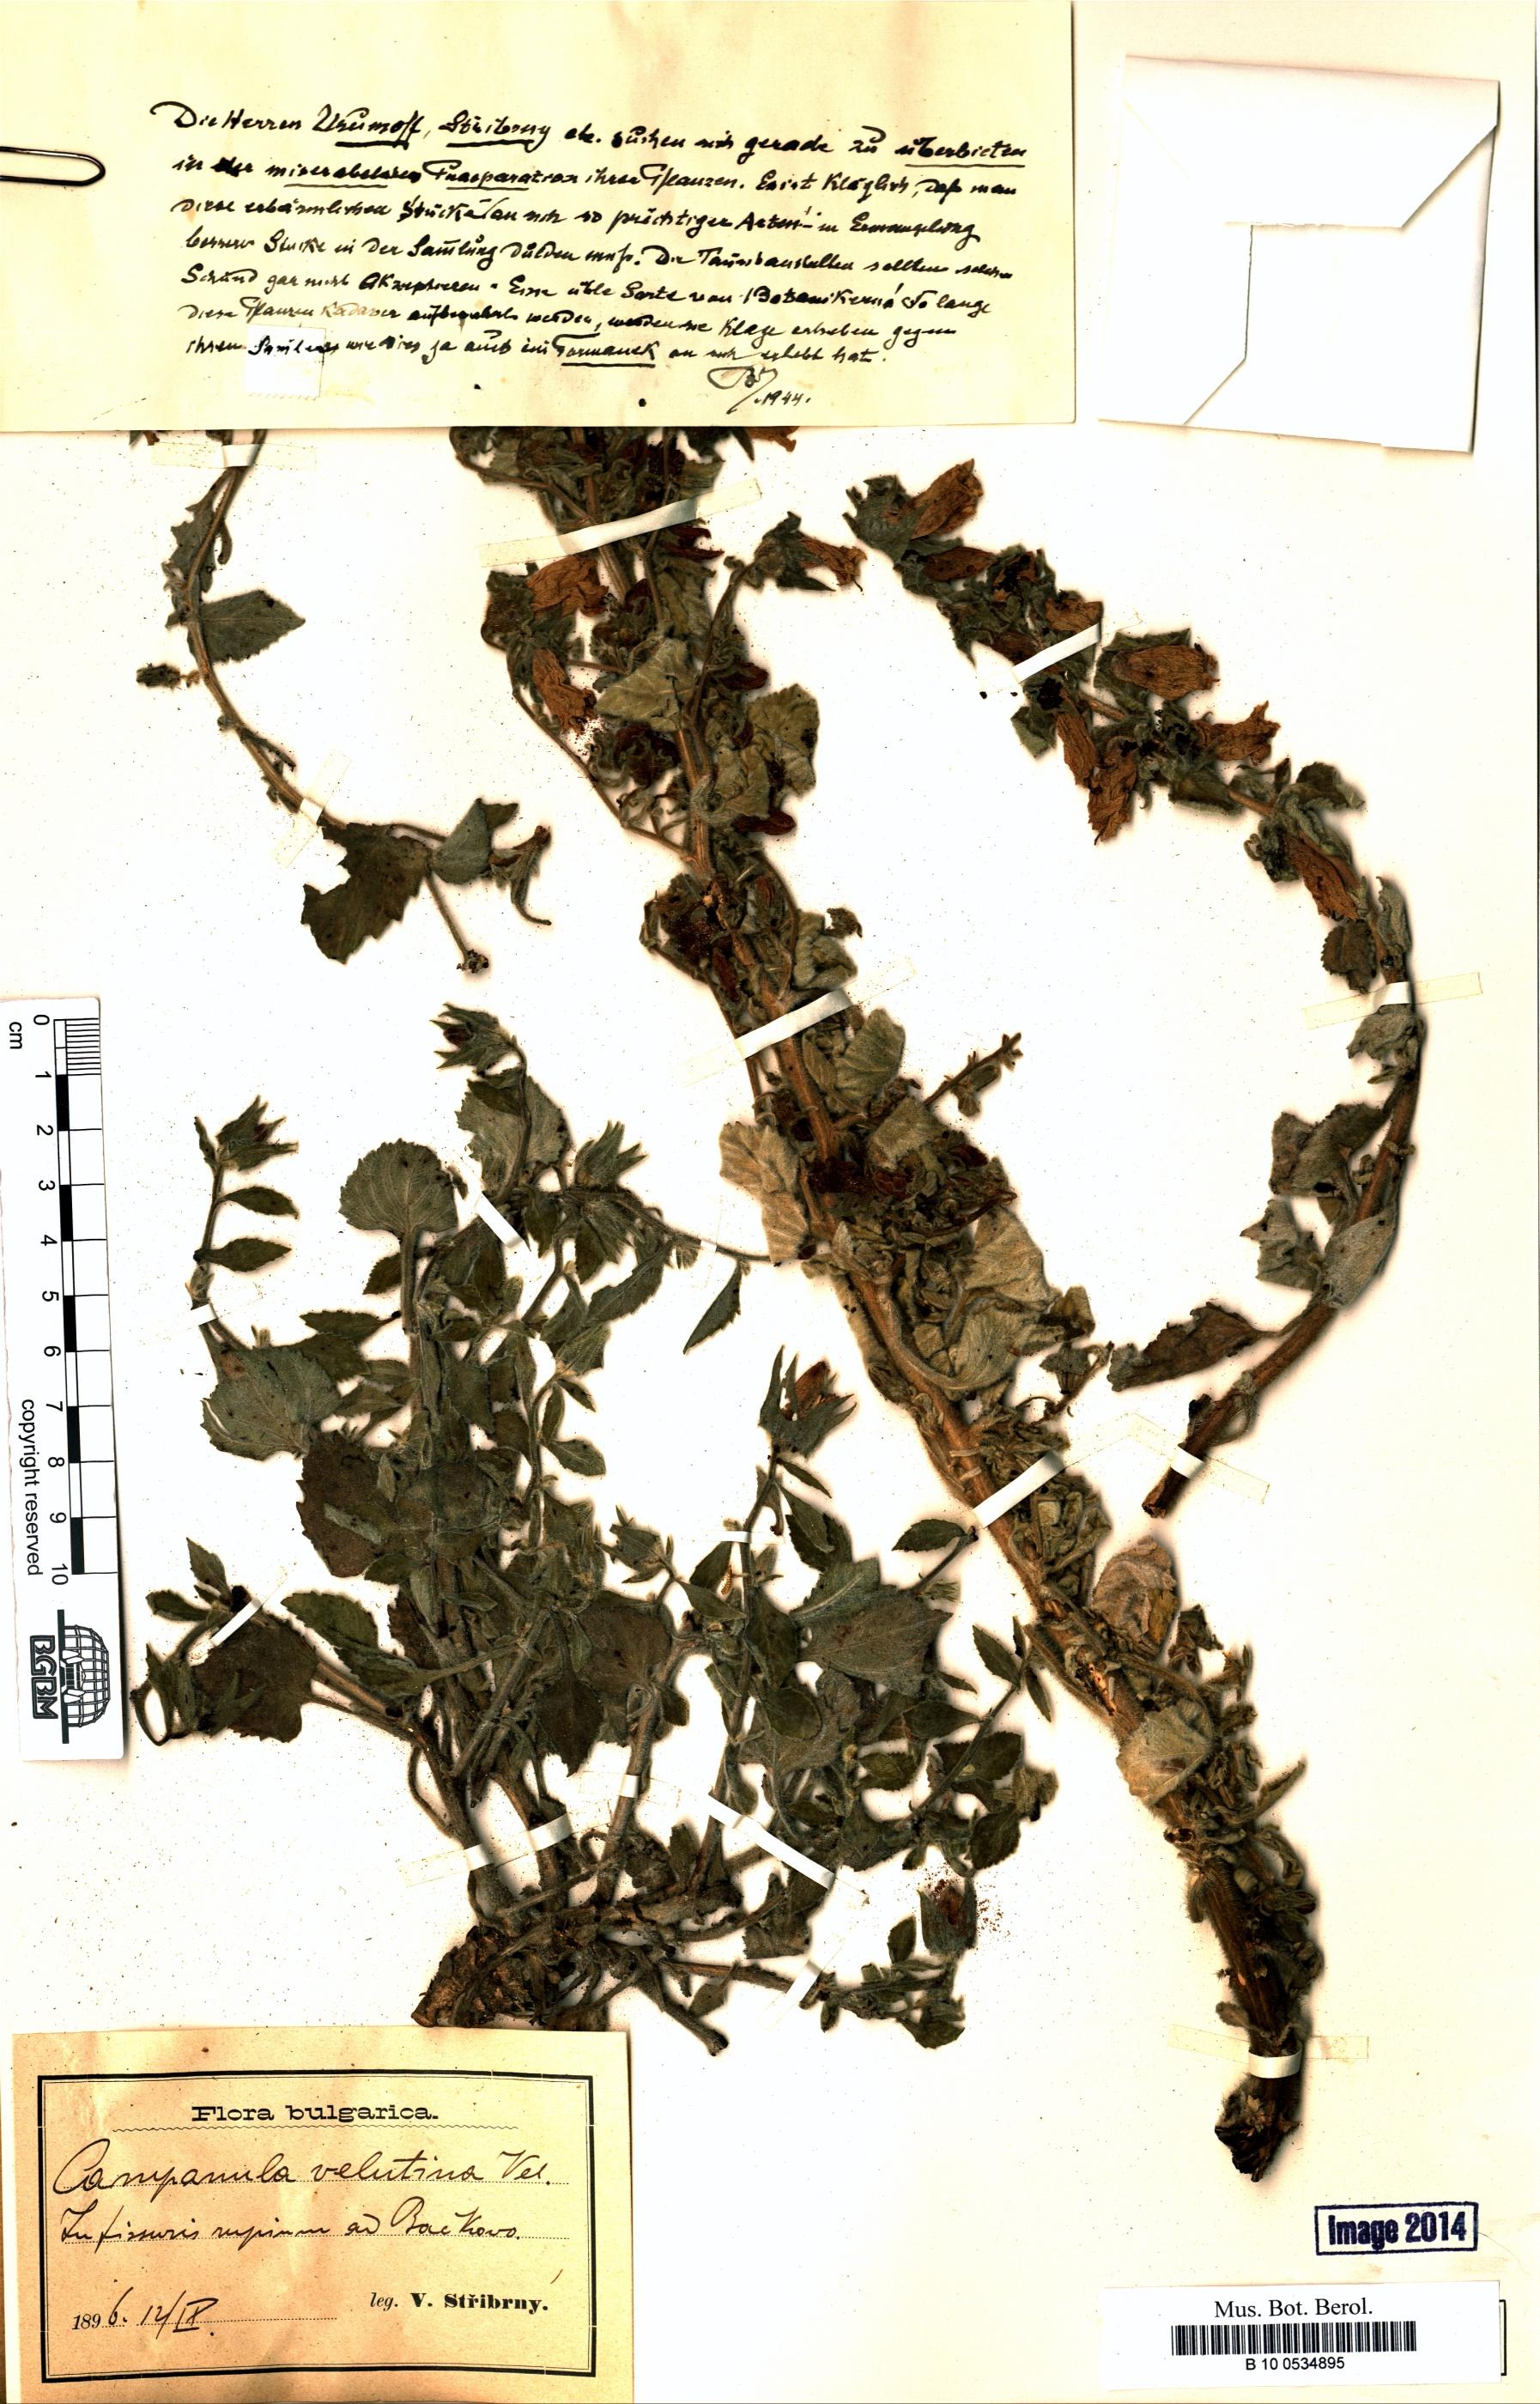 http://ww2.bgbm.org/herbarium/images/B/10/05/34/89/B_10_0534895.jpg